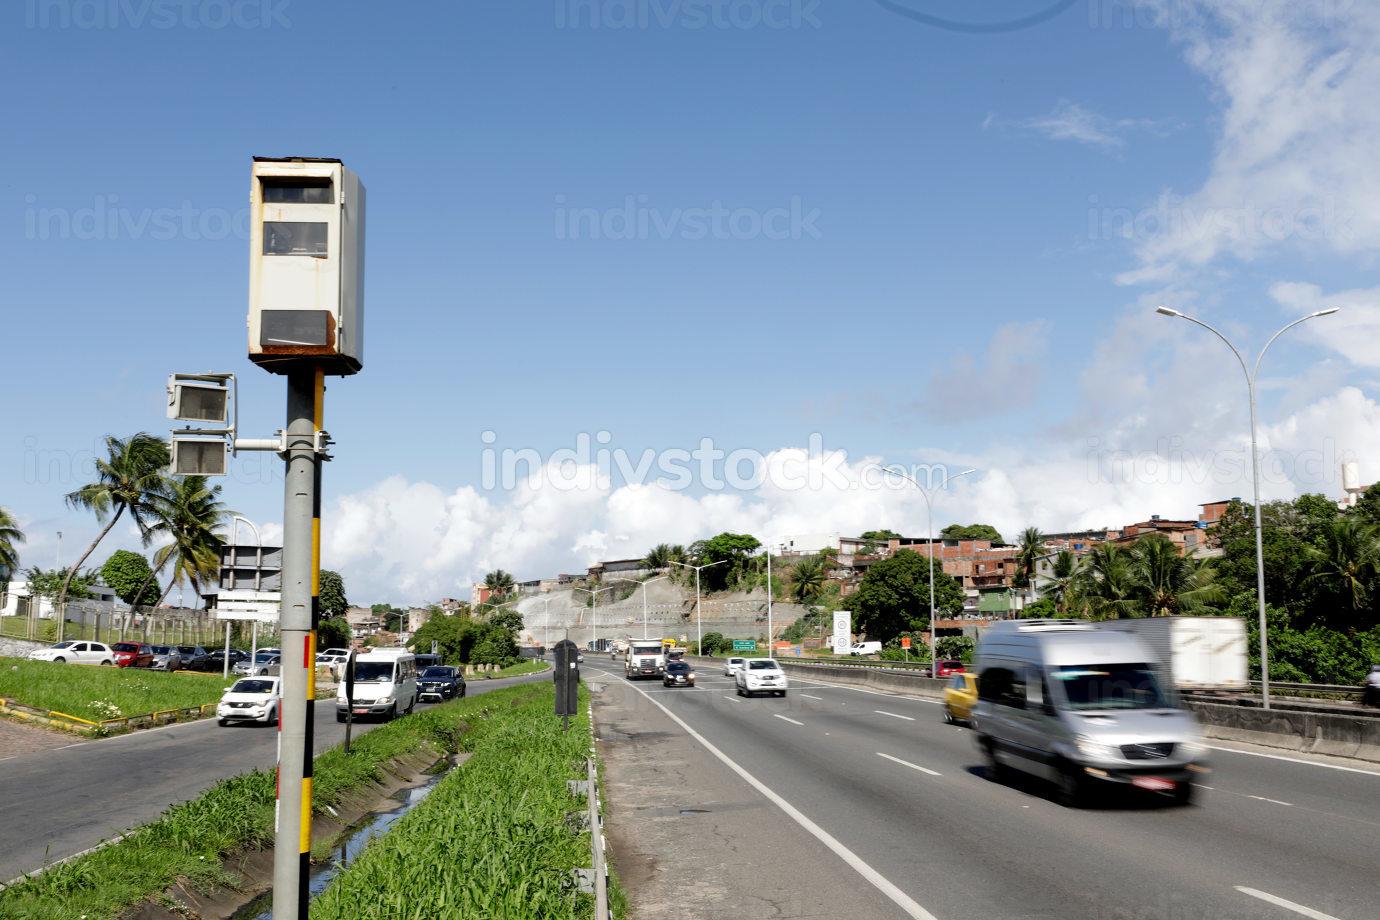 salvador, bahia Brazil, April 24, 2019, speed radar deployed on the BR 324 highway.